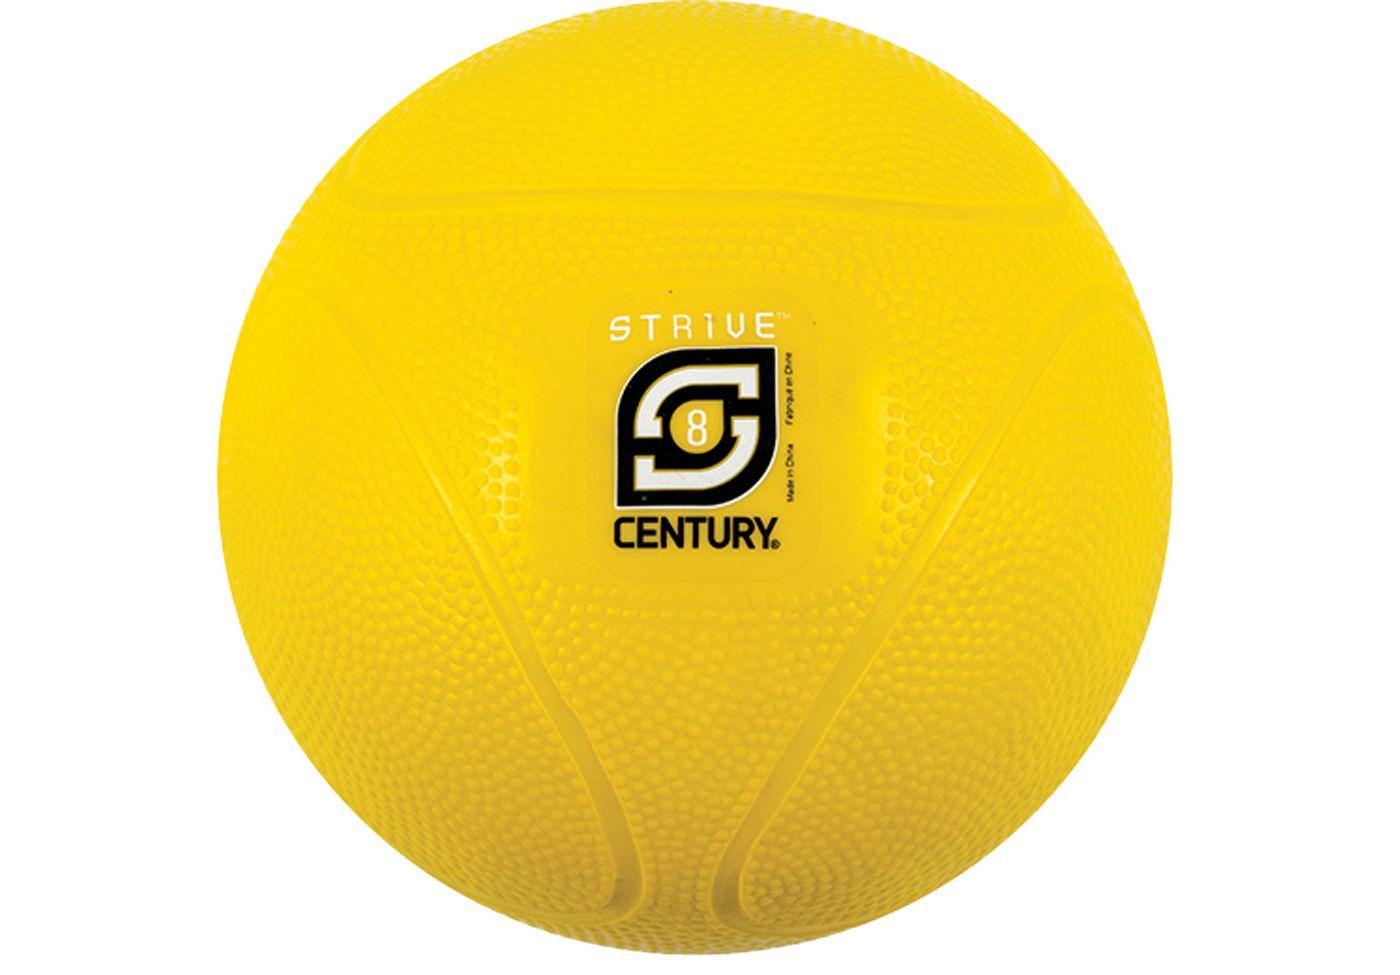 Century Strive 8 lb. Medicine Ball